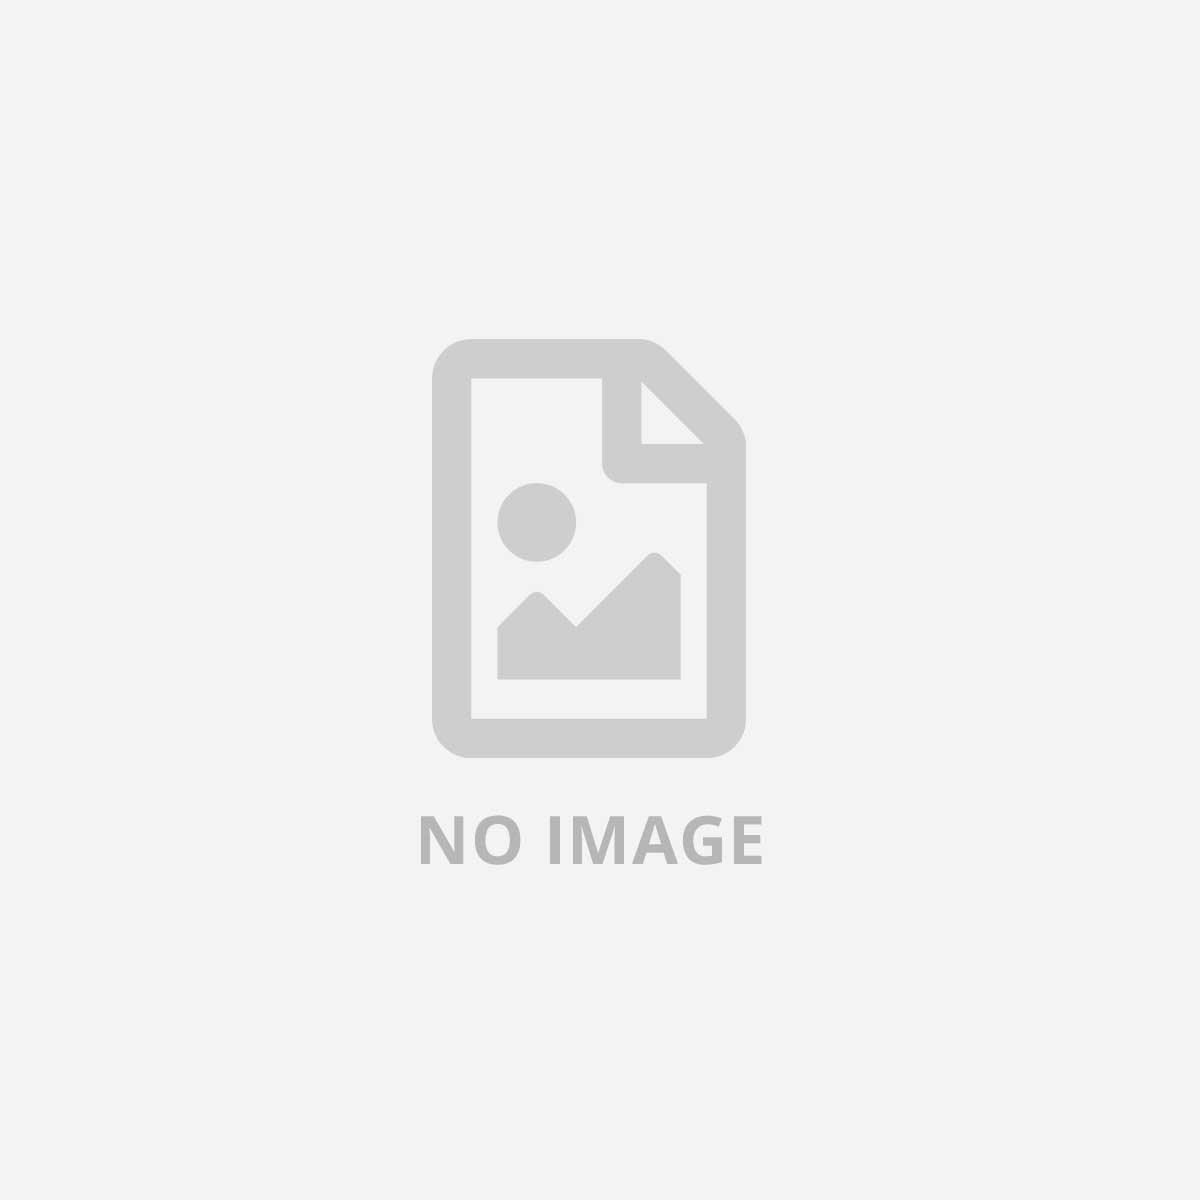 HAMLET MODEM ISDN ESTERNO USB